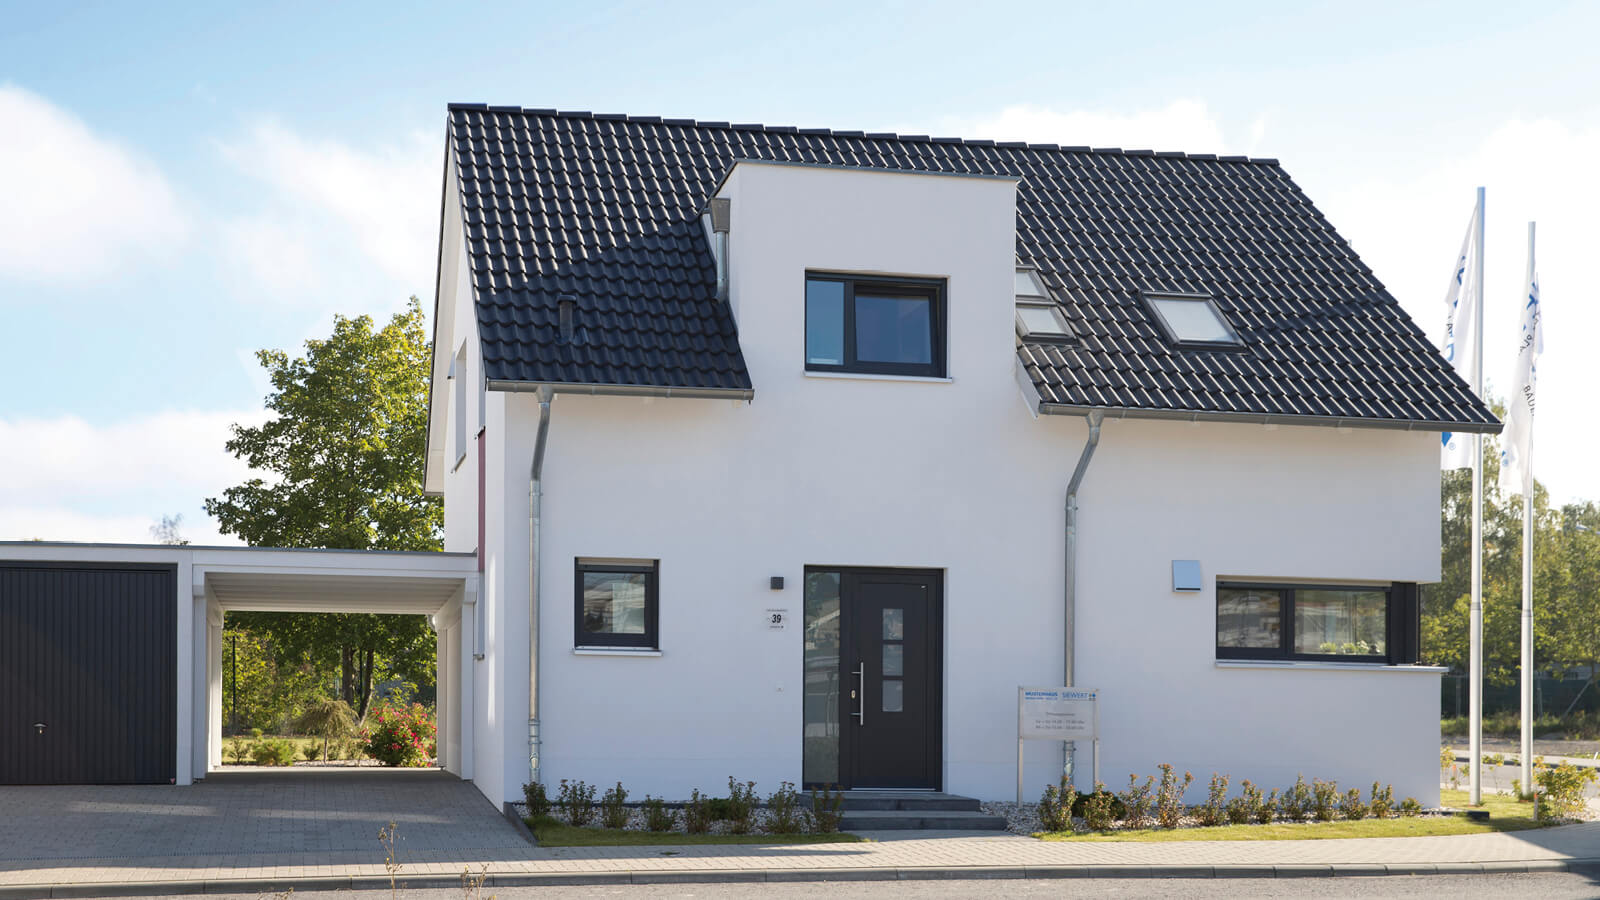 Musterhaus waldstra enviertel siewert hausbau for Haus bauen muster